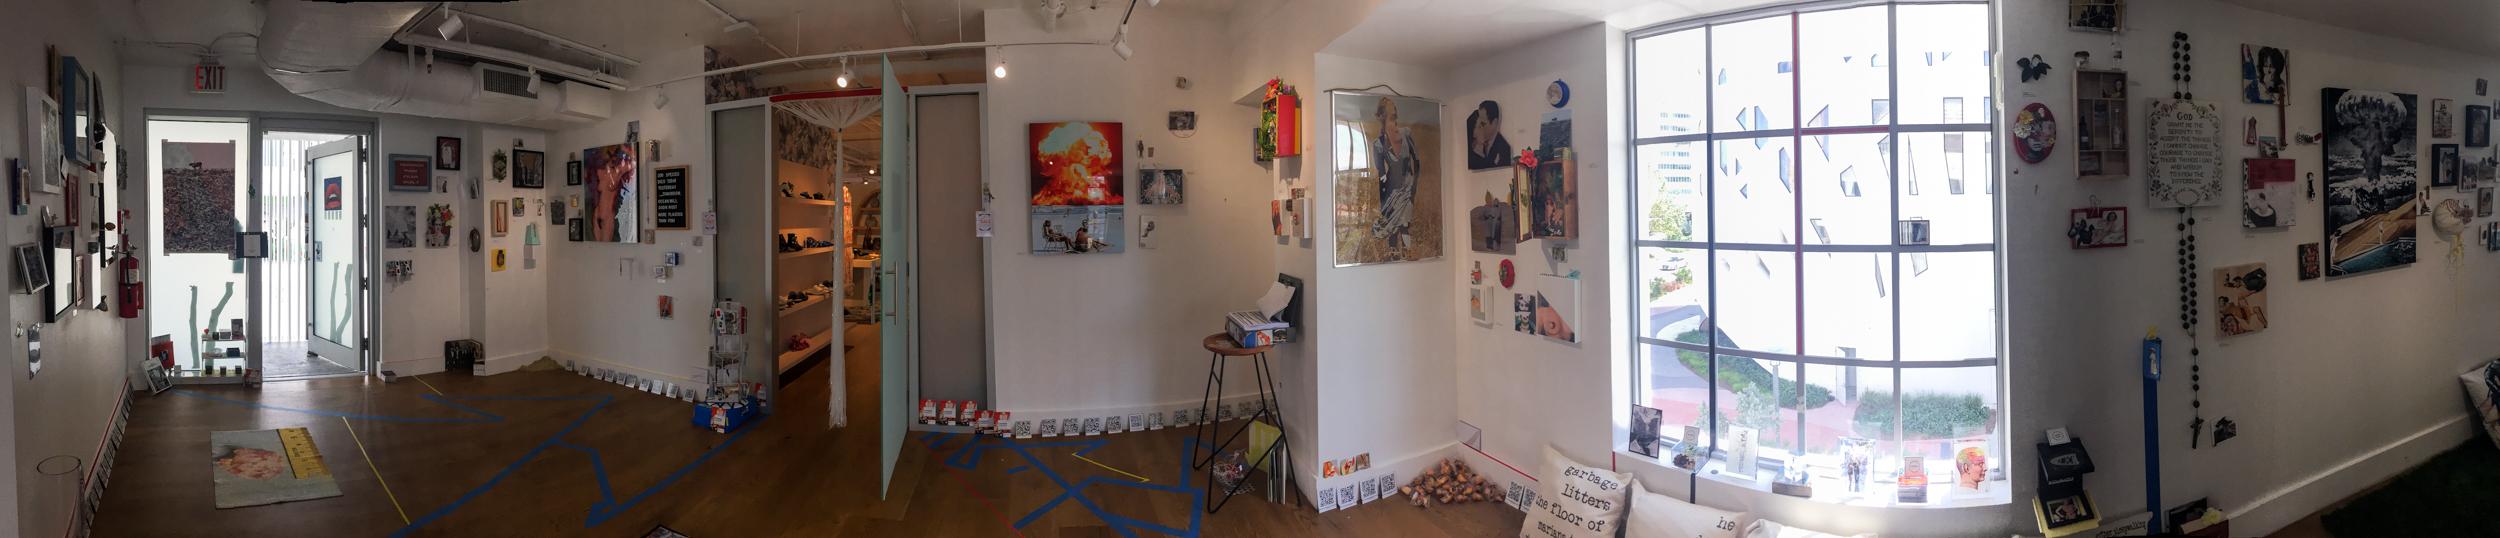 Faena-Exhibition-Images-132.jpg